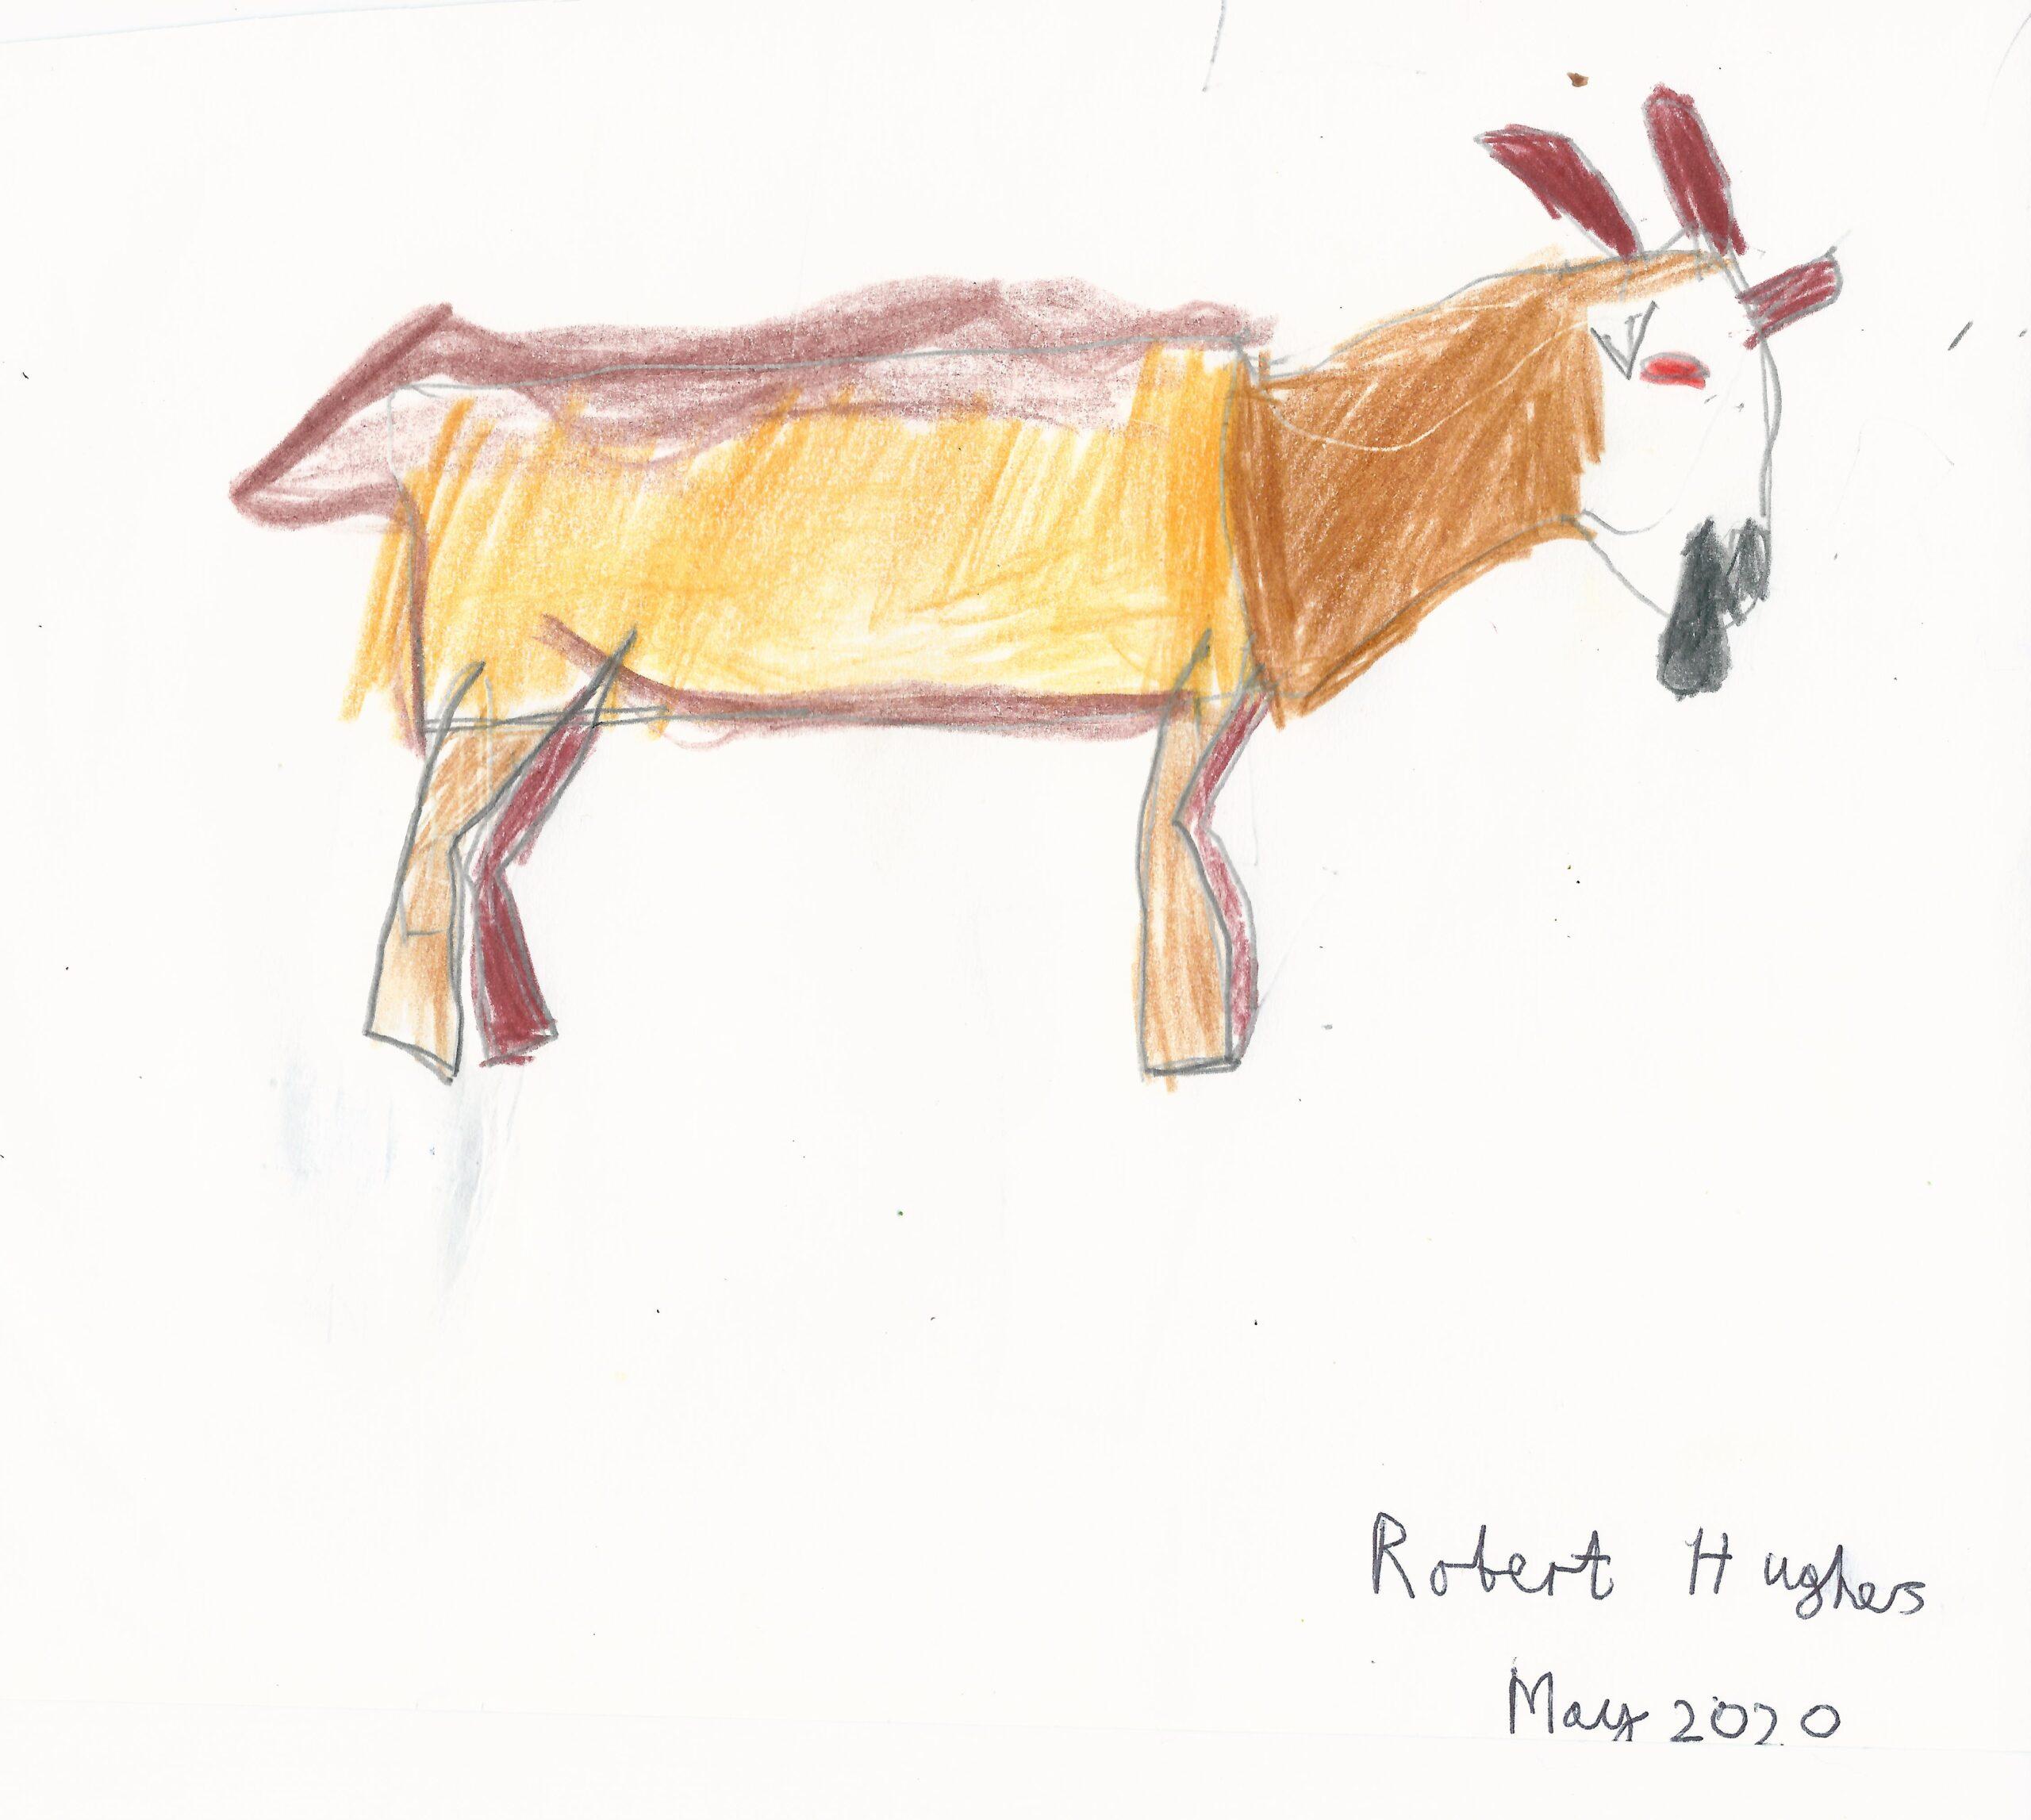 Robert Hughes, Age 12